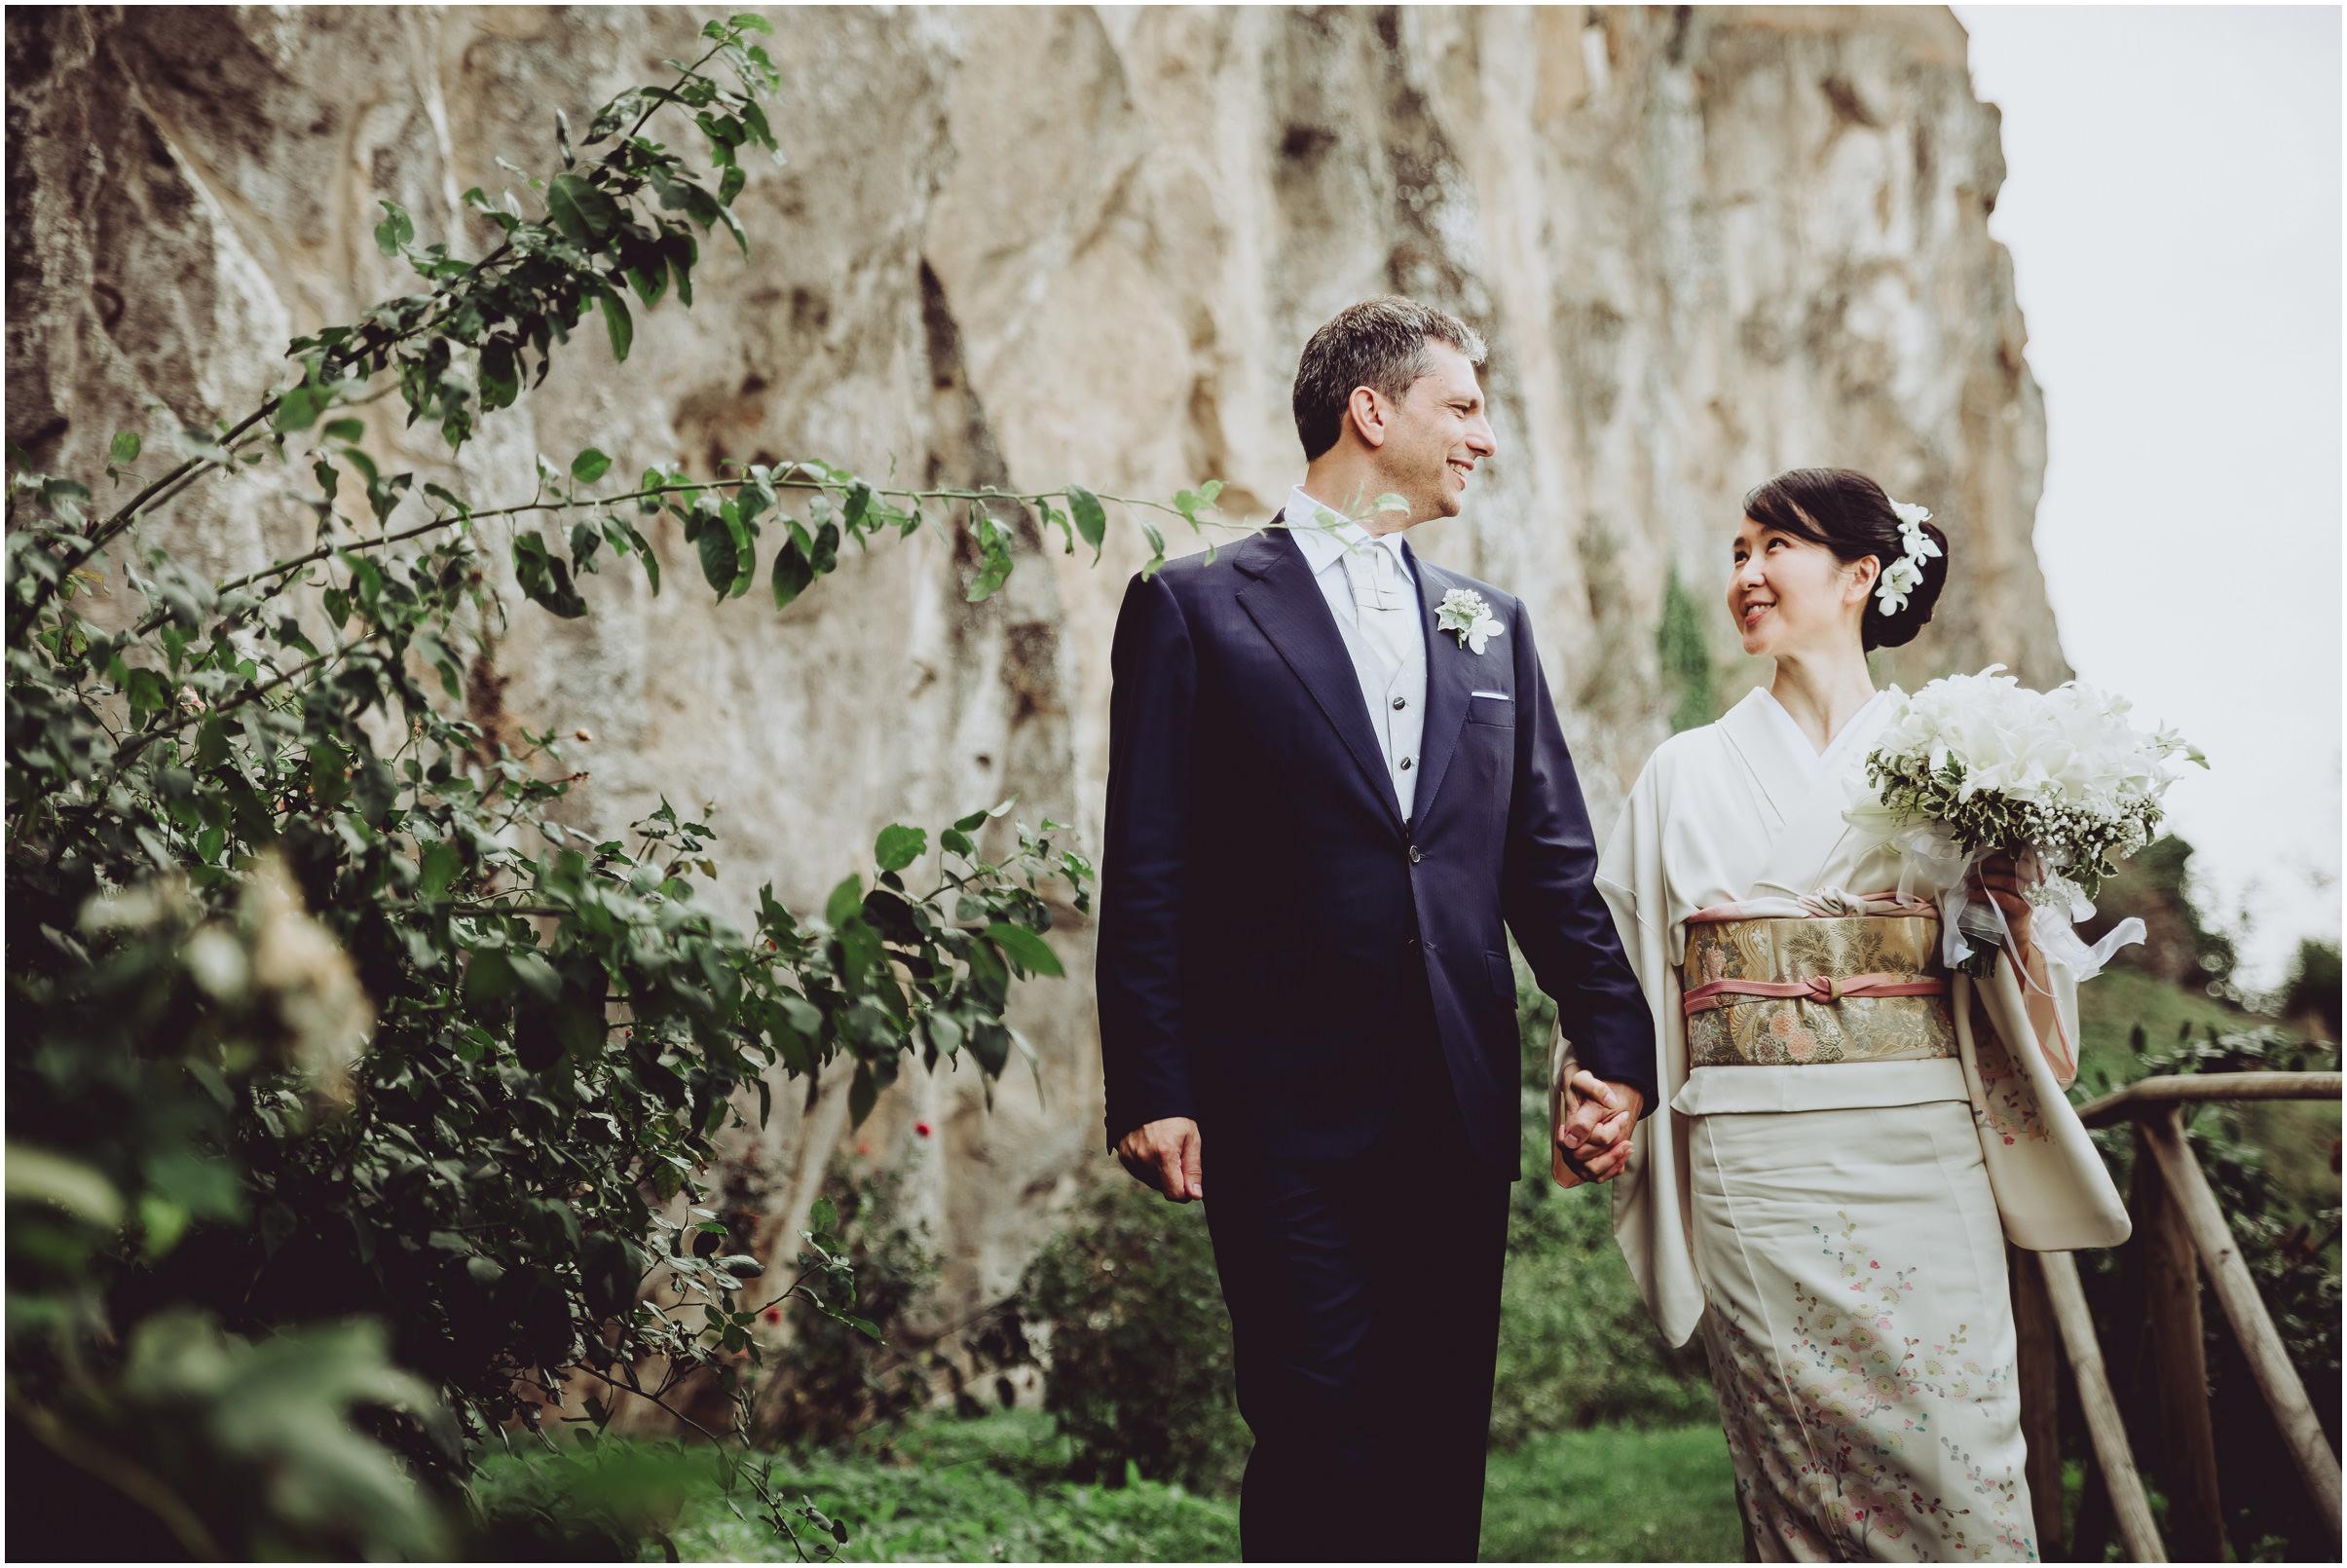 WEDDING-PHOTOGRAPHY-SARA-LORENZONI-FOTOGRAFIA-MATRIMONIO-ORVIETO-JUKA-ANTONELLO42